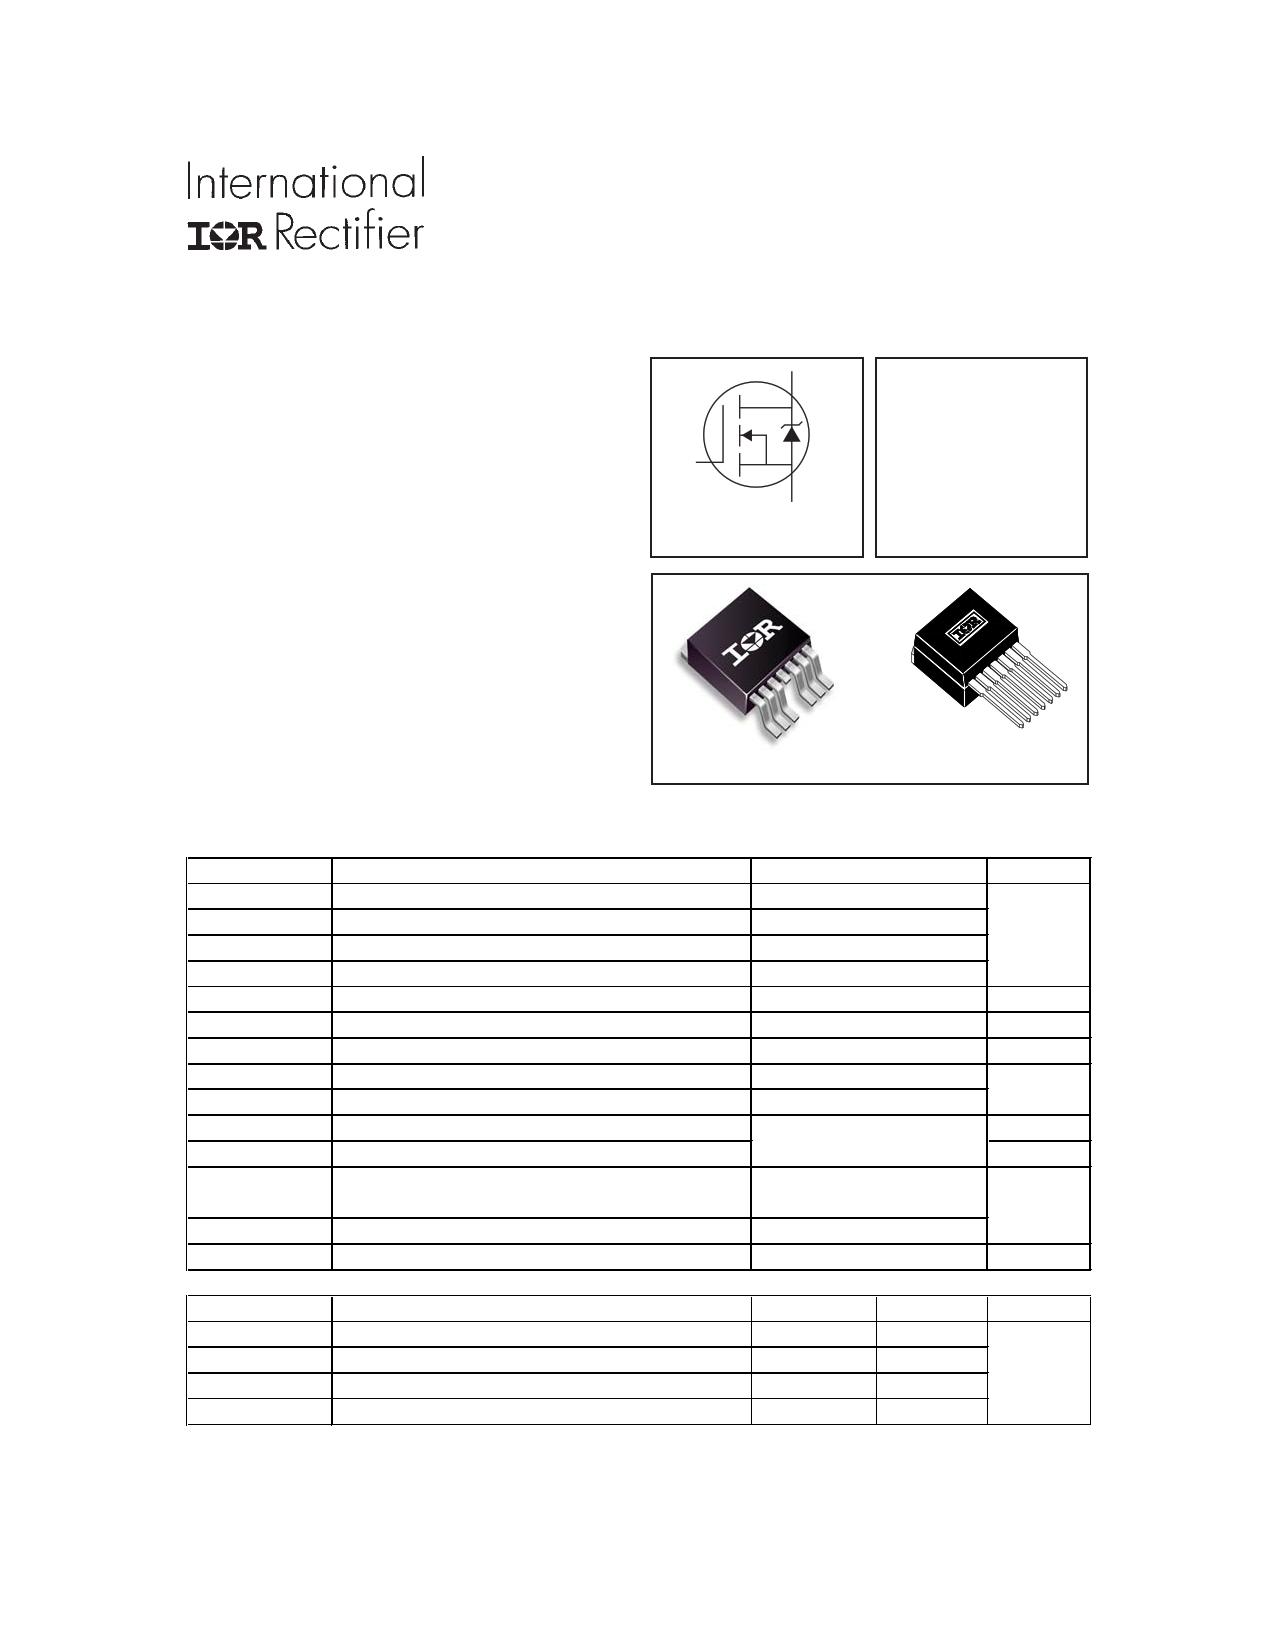 IRF1405ZL-7P Datasheet, IRF1405ZL-7P PDF,ピン配置, 機能